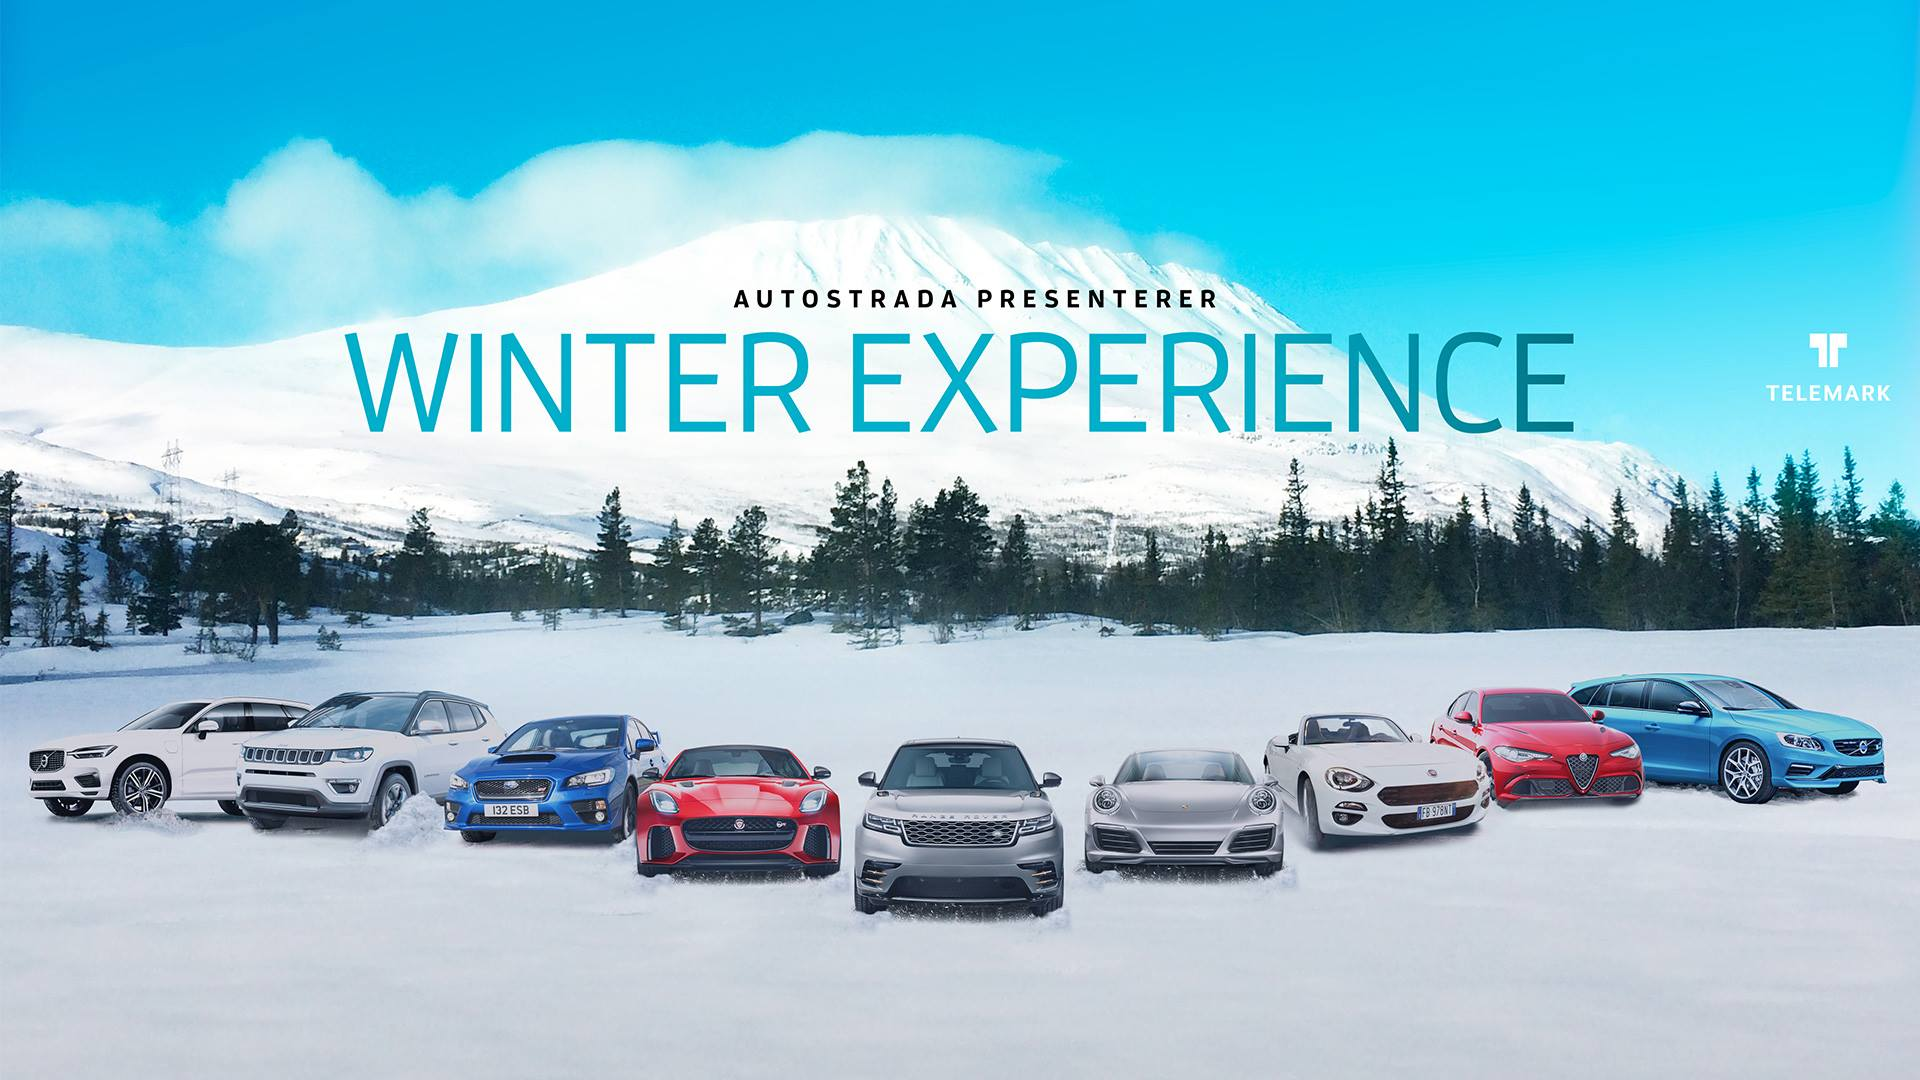 Autostrada Winter Experience 2019